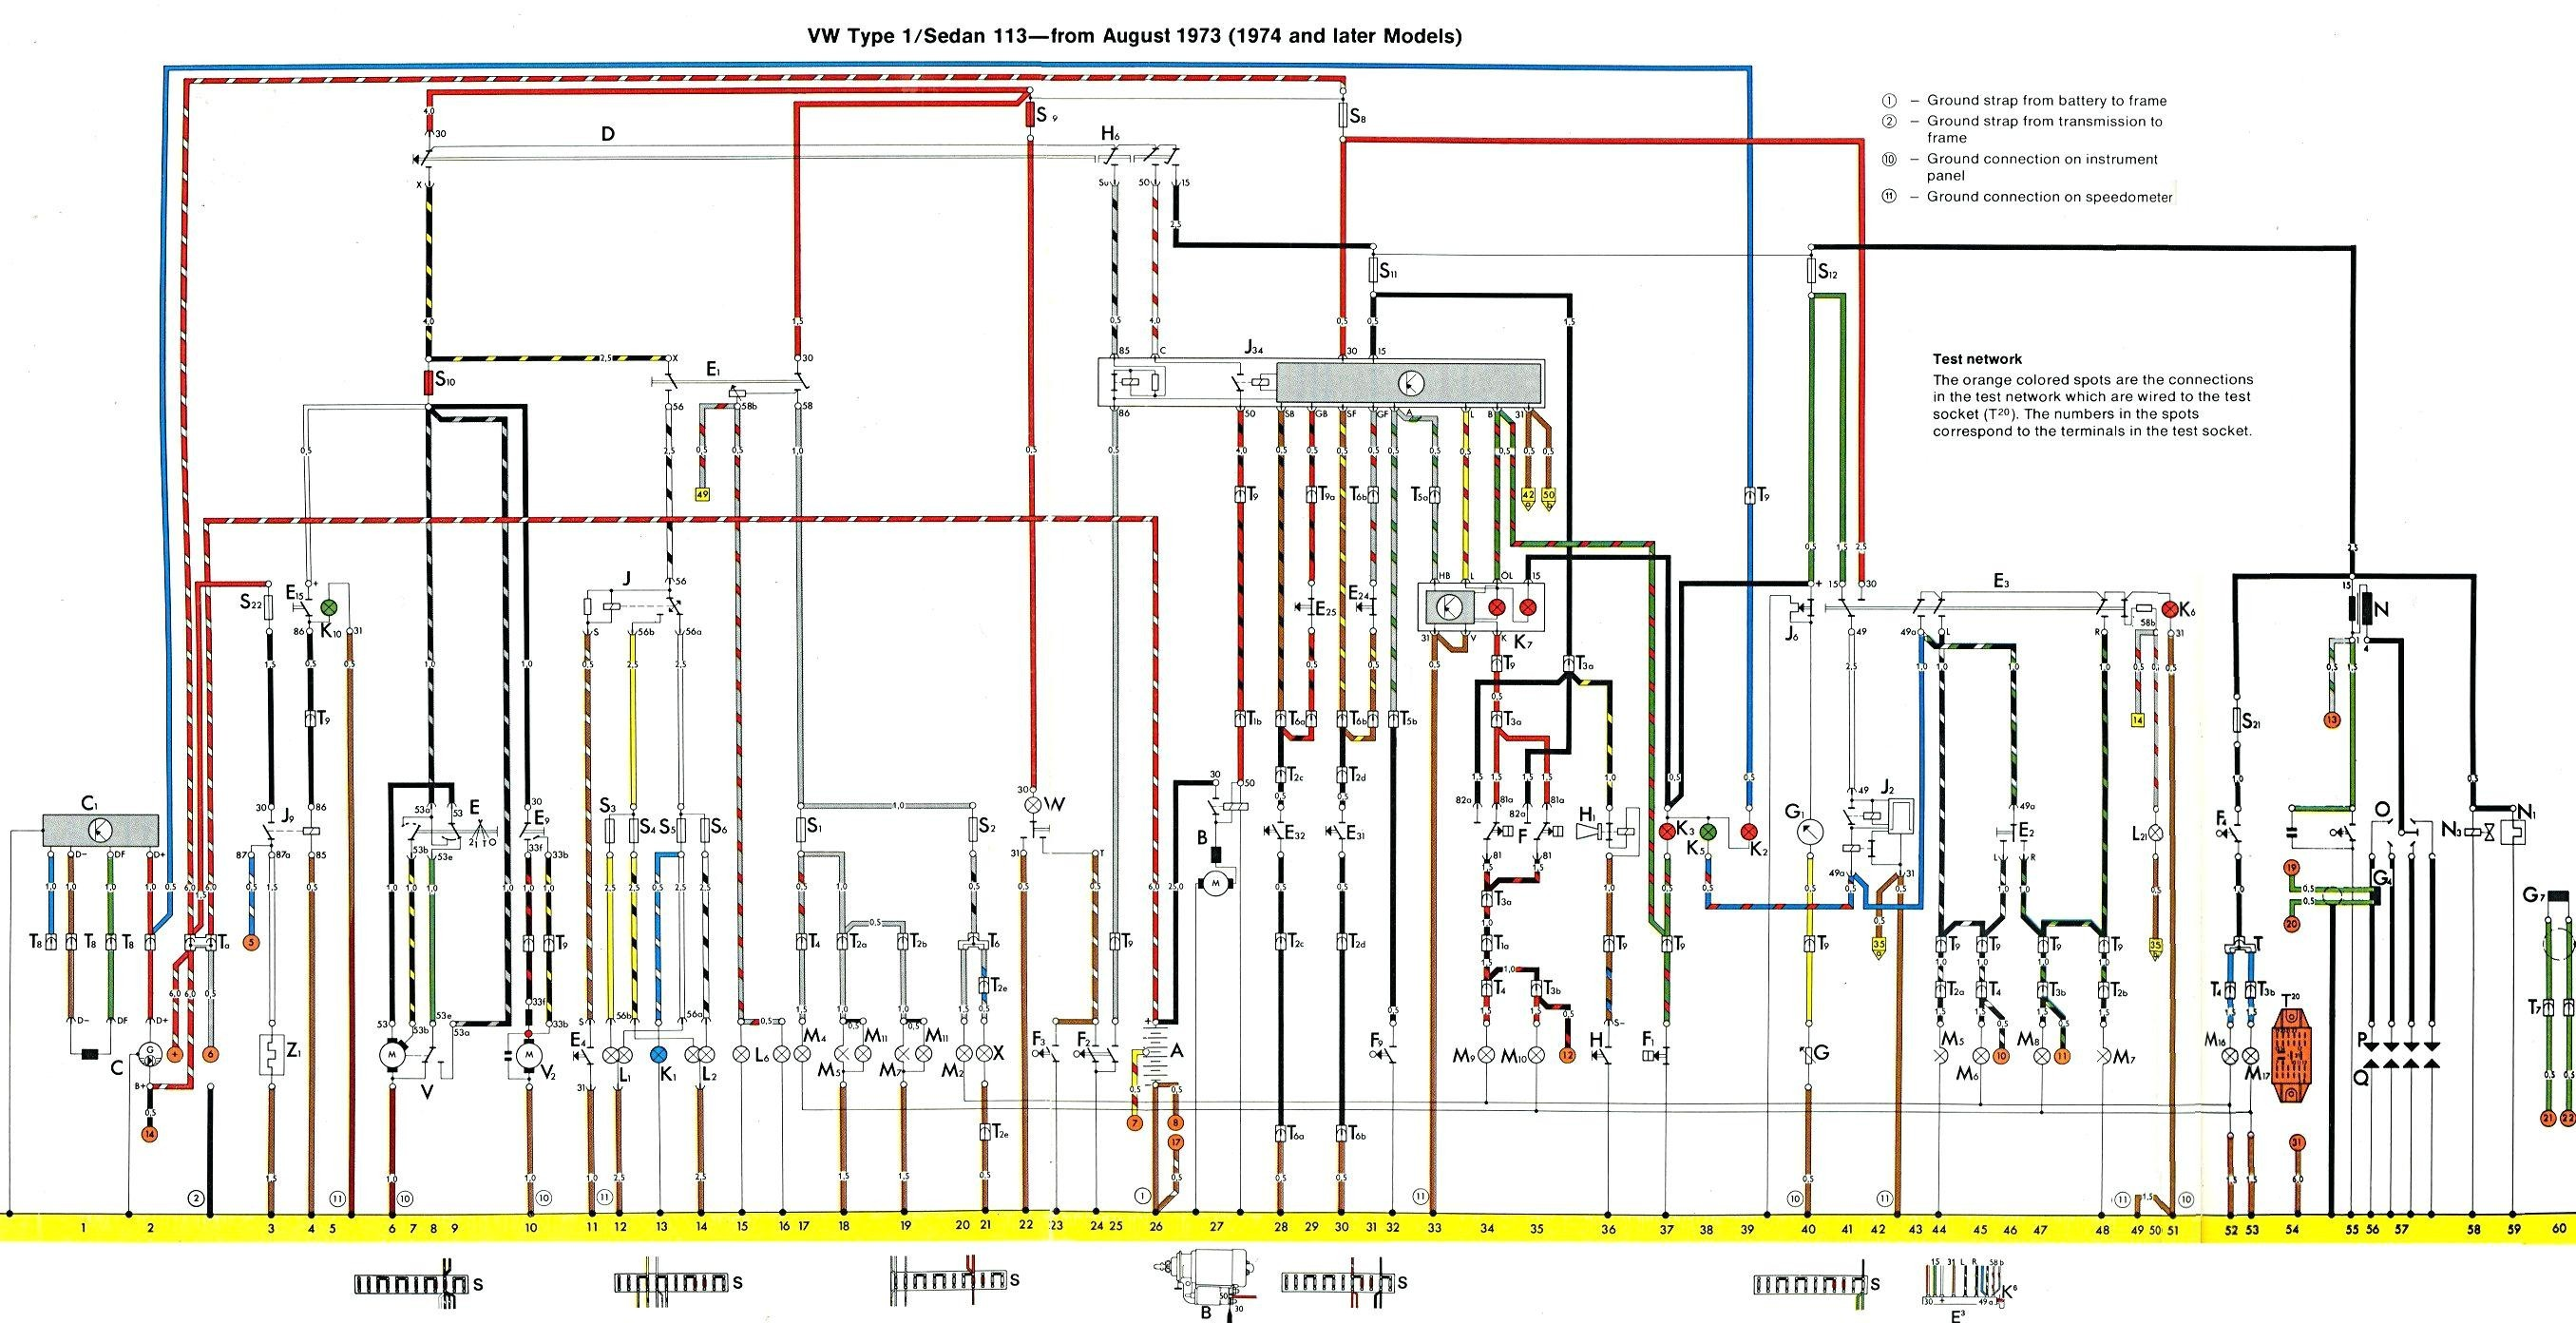 [DIAGRAM_4FR]  Wiring Diagram Speedometer Cbr 150 | L9000 Wiring Schematic For Speedometer |  | Wiring Diagram